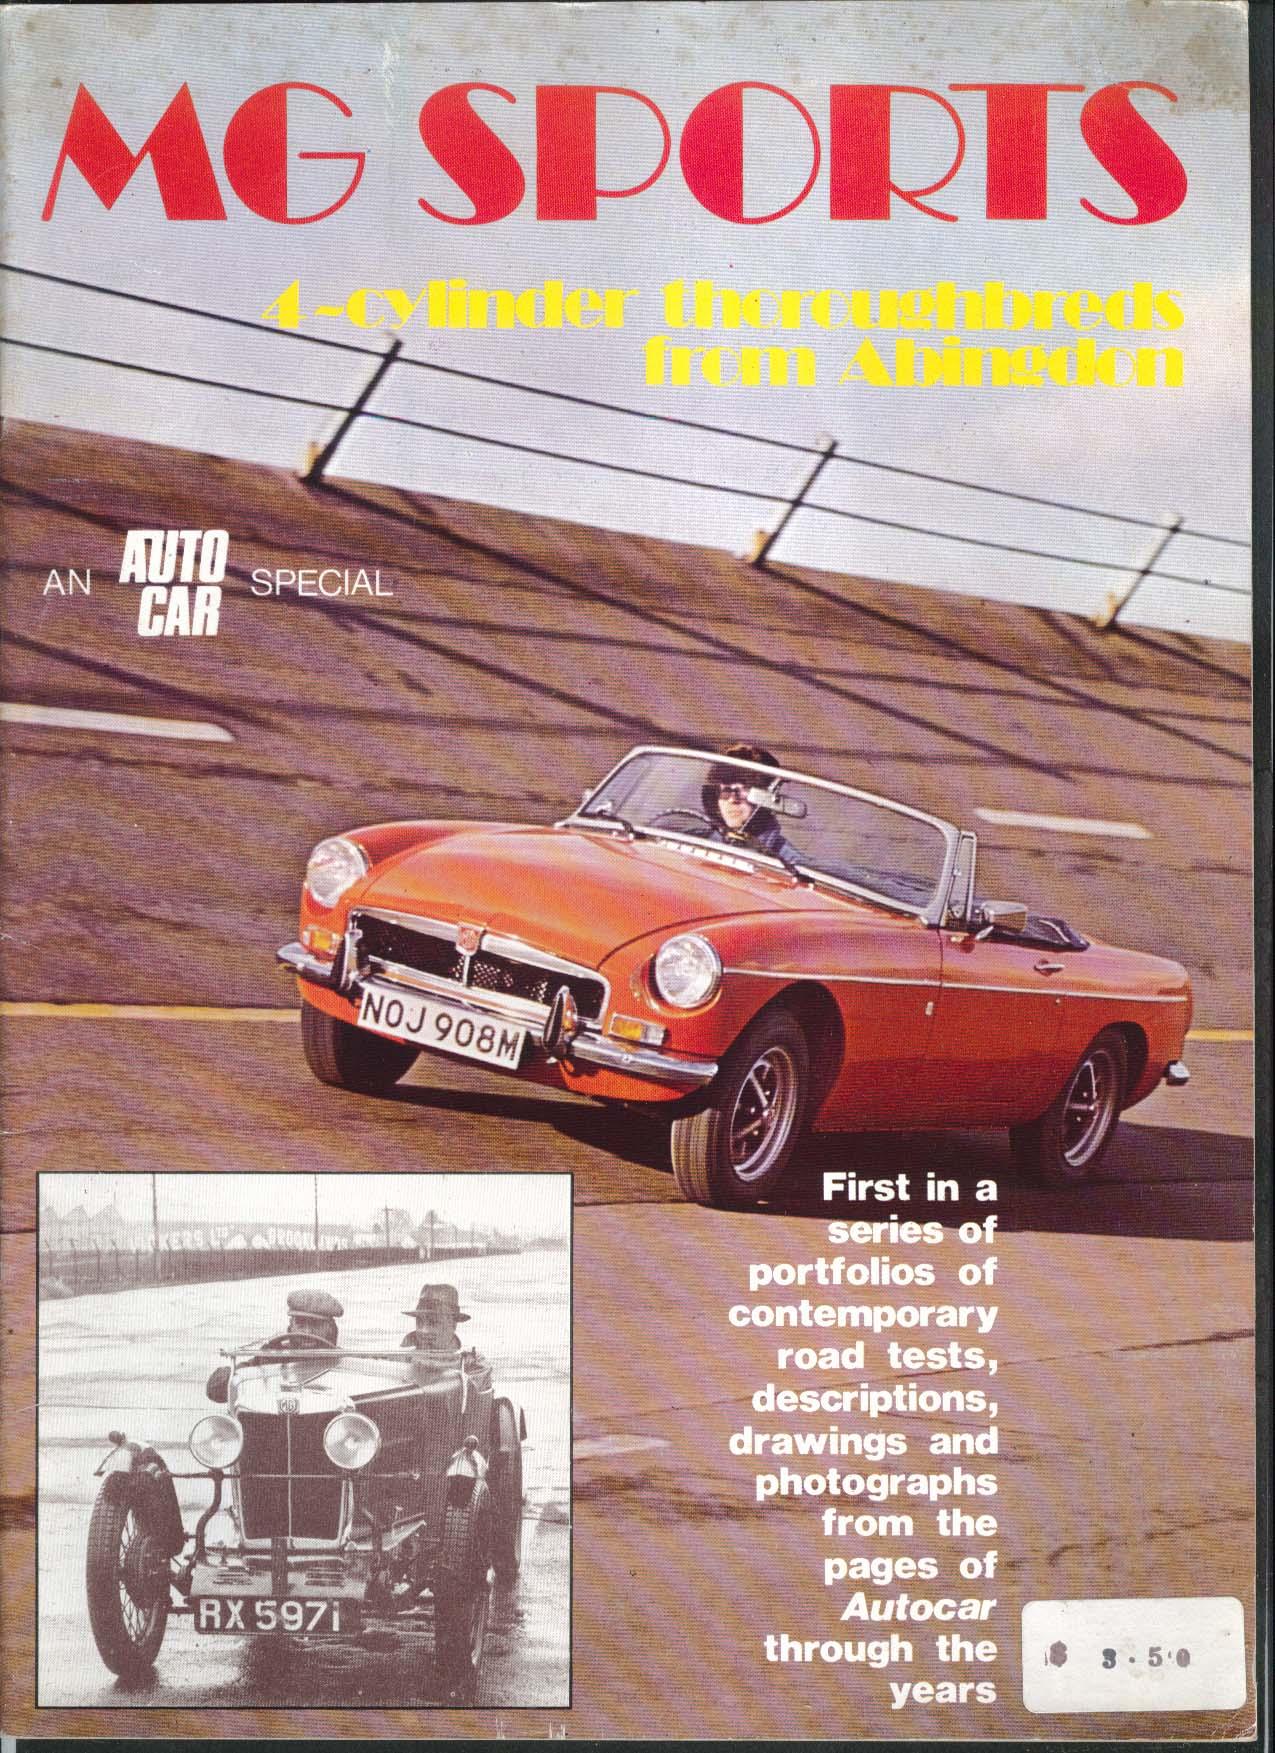 MG SPORTS Autocar Special M-type Montlhery J2 P-type PB Series T TC TD Midget ++